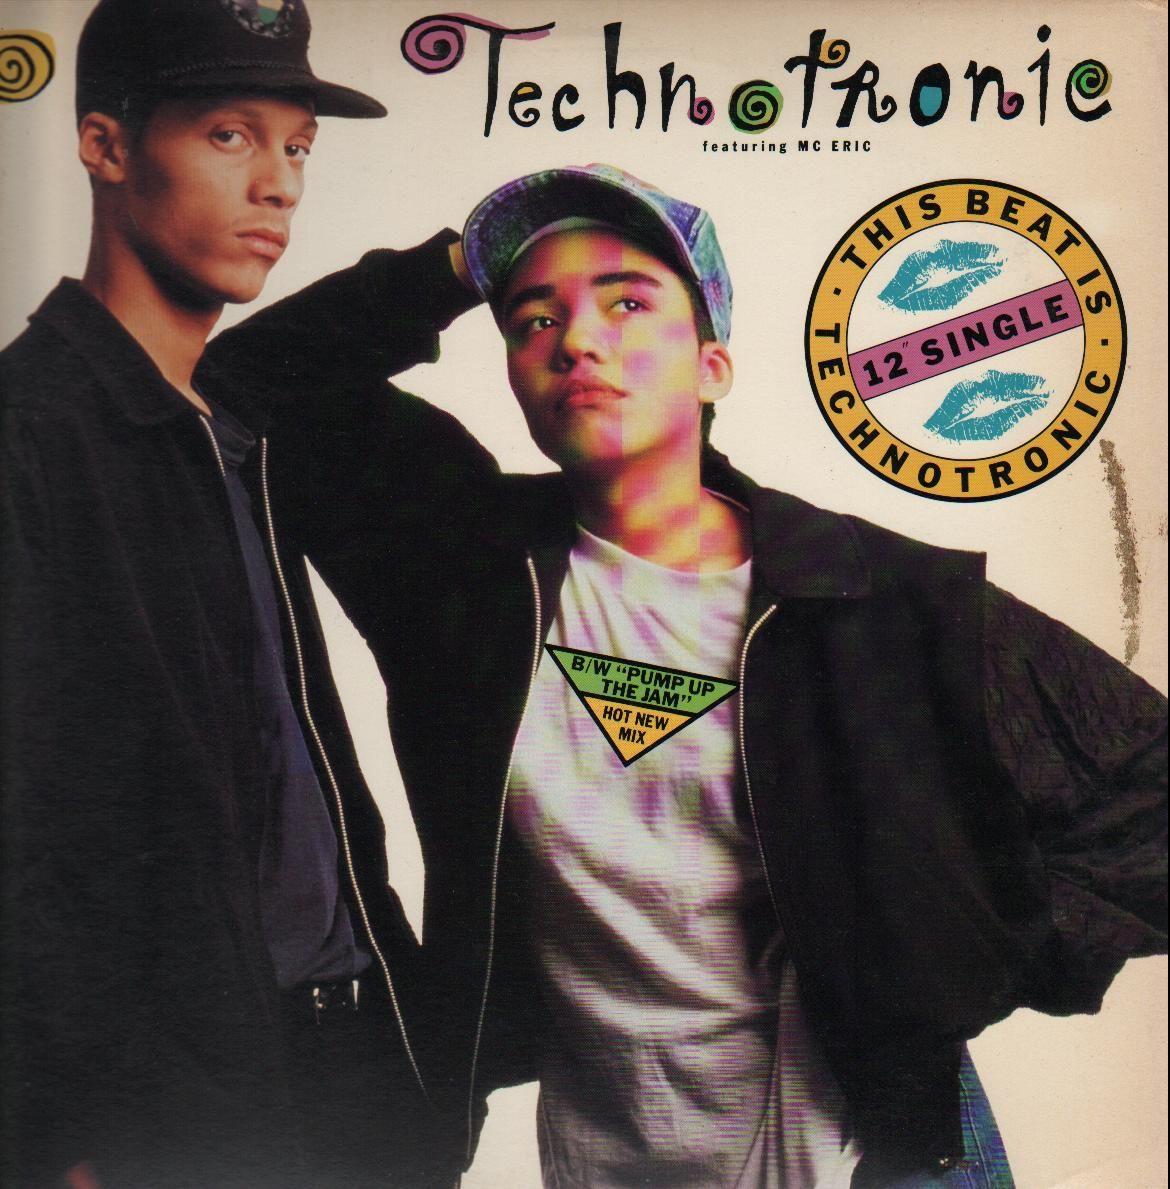 technotronic-this_beat_is_technotronic(1).jpg